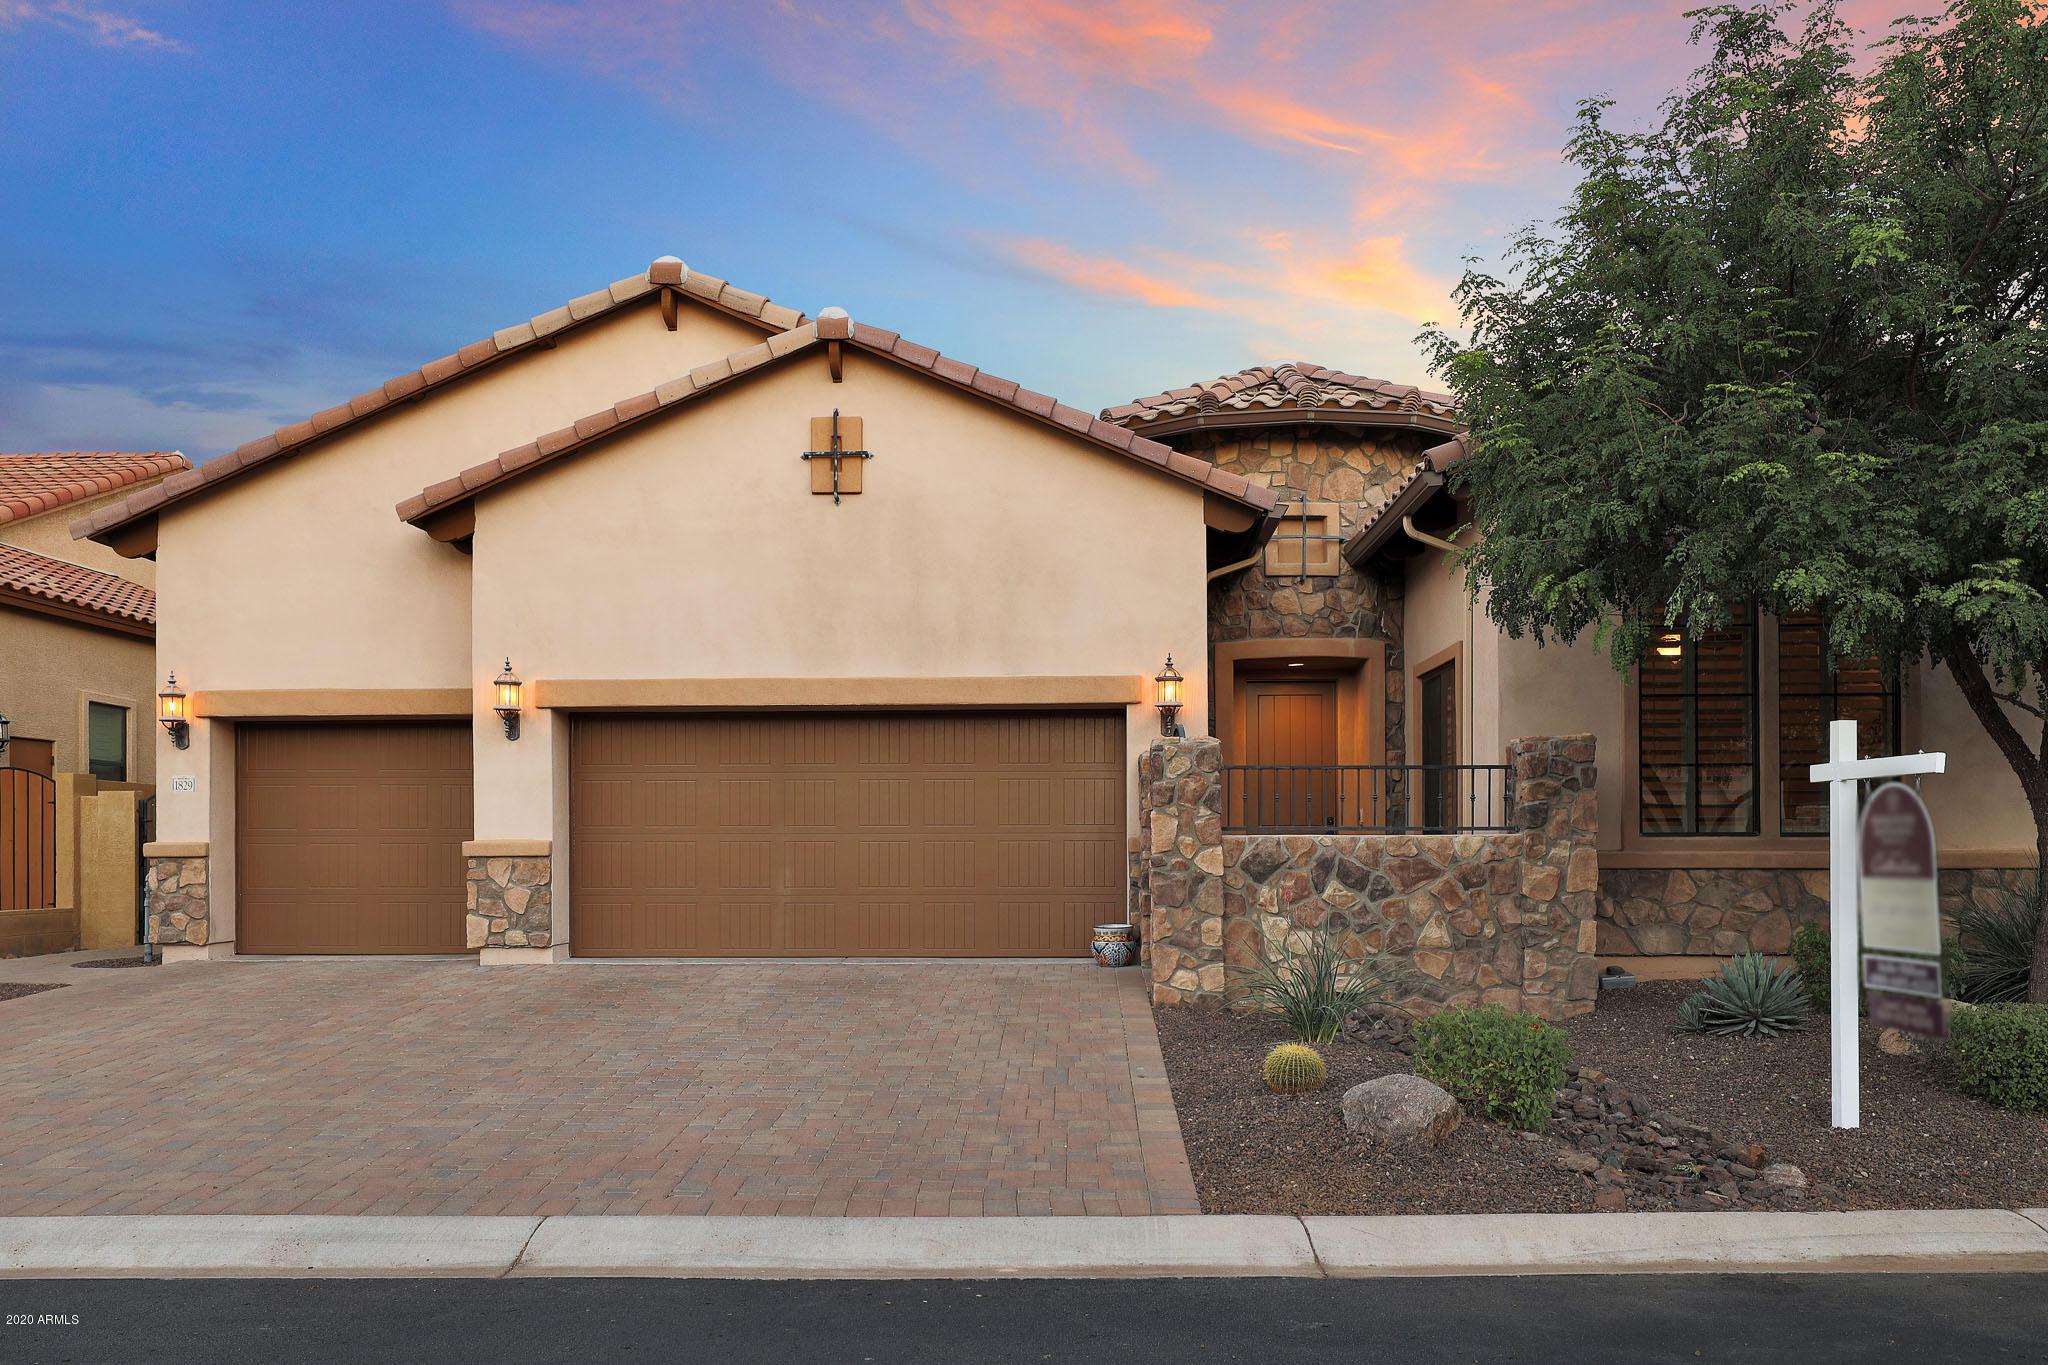 Photo of 1829 N SHELBY --, Mesa, AZ 85207